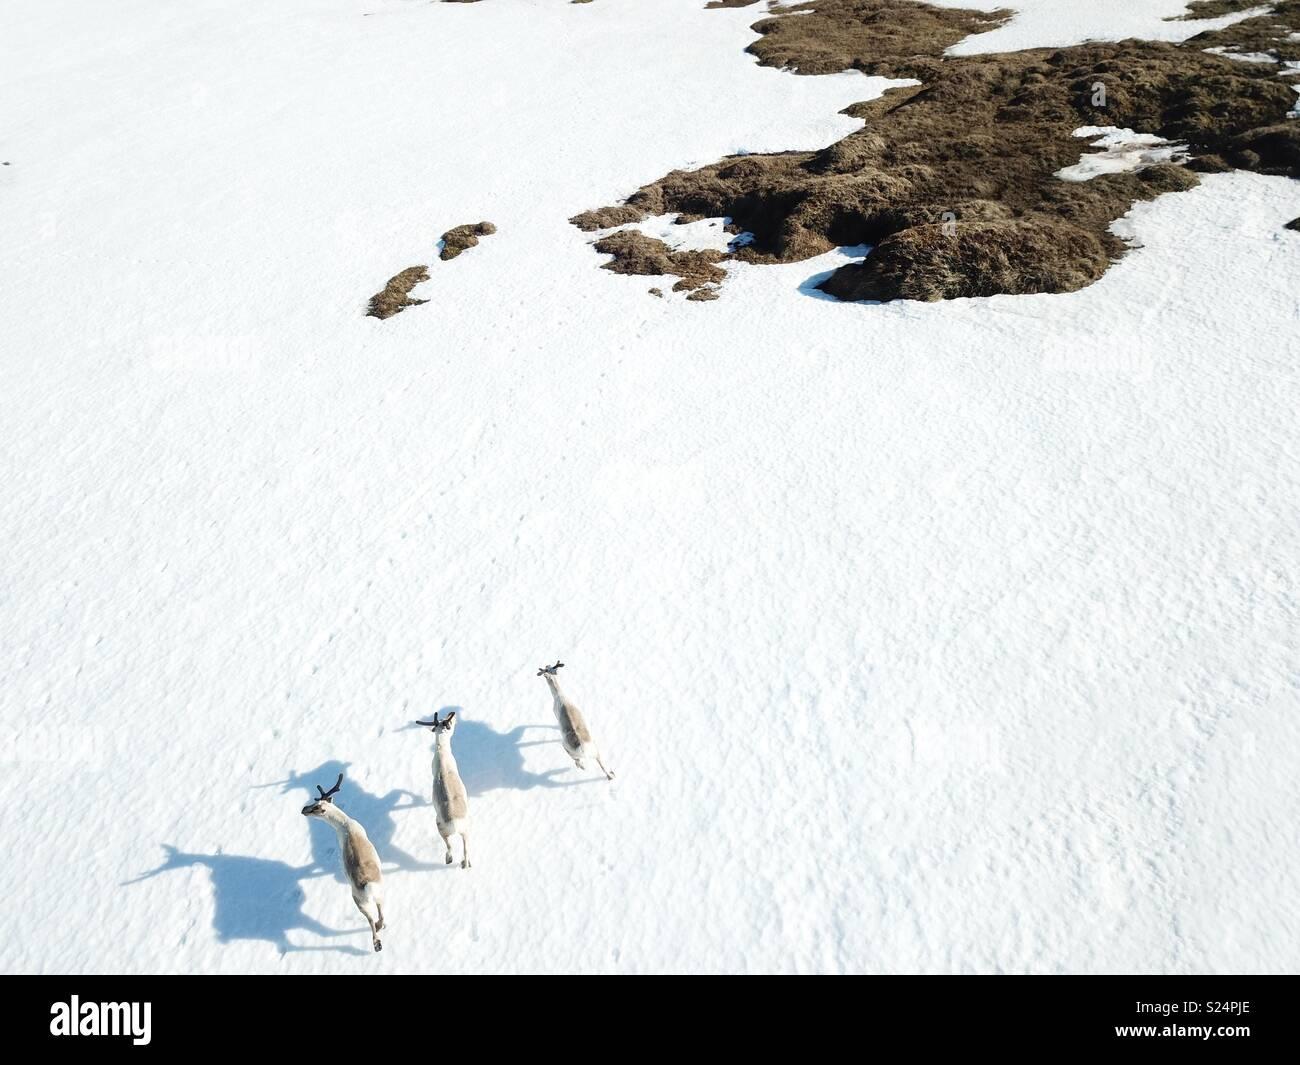 Reindeers - Stock Image